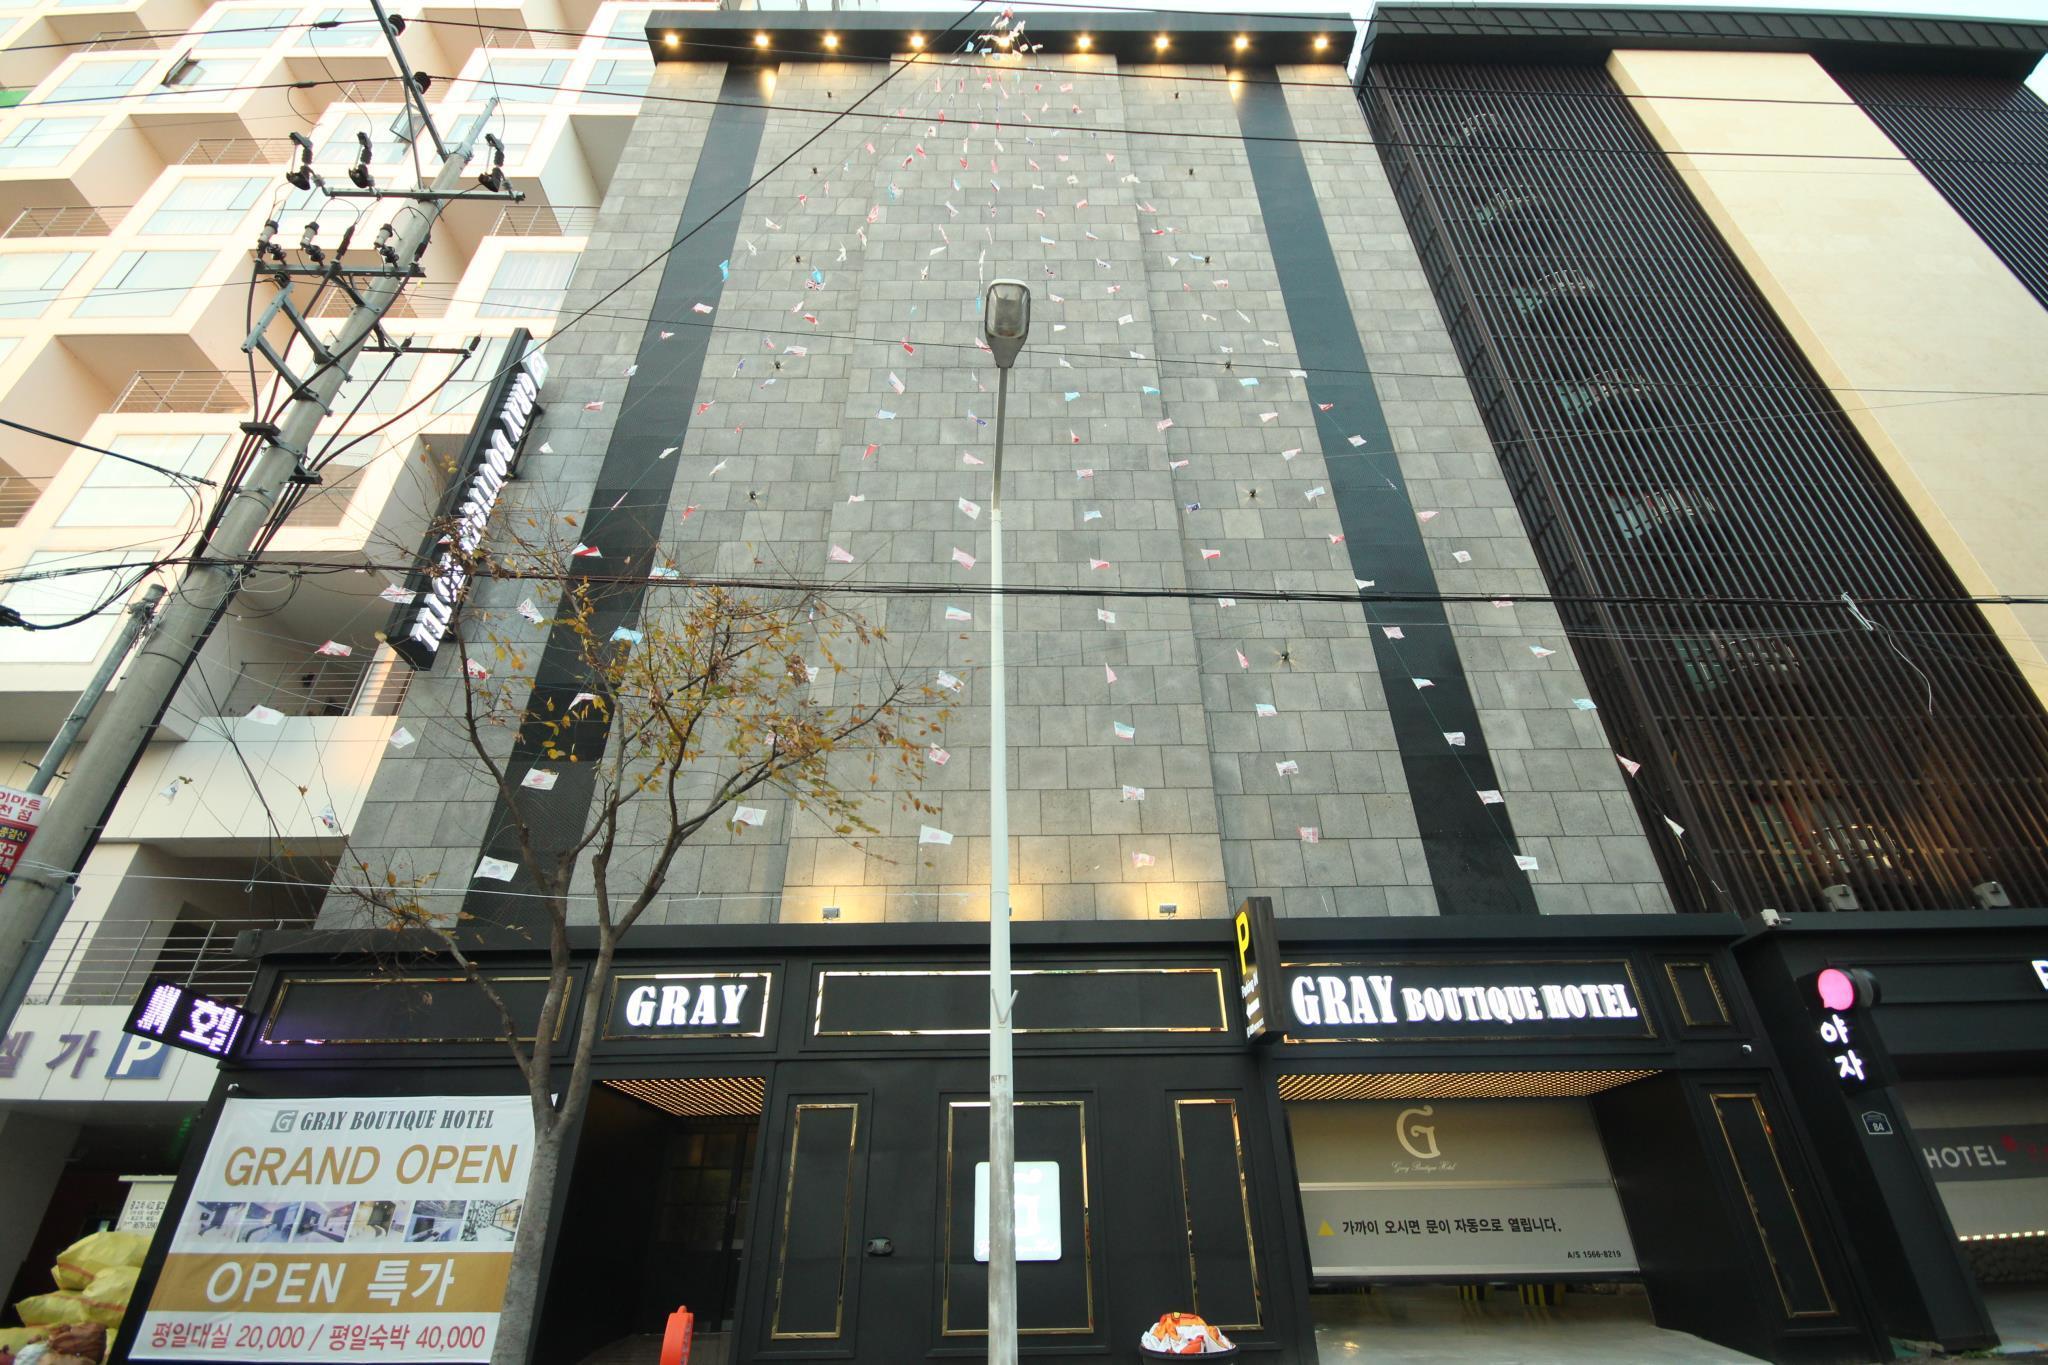 Gray Hotel